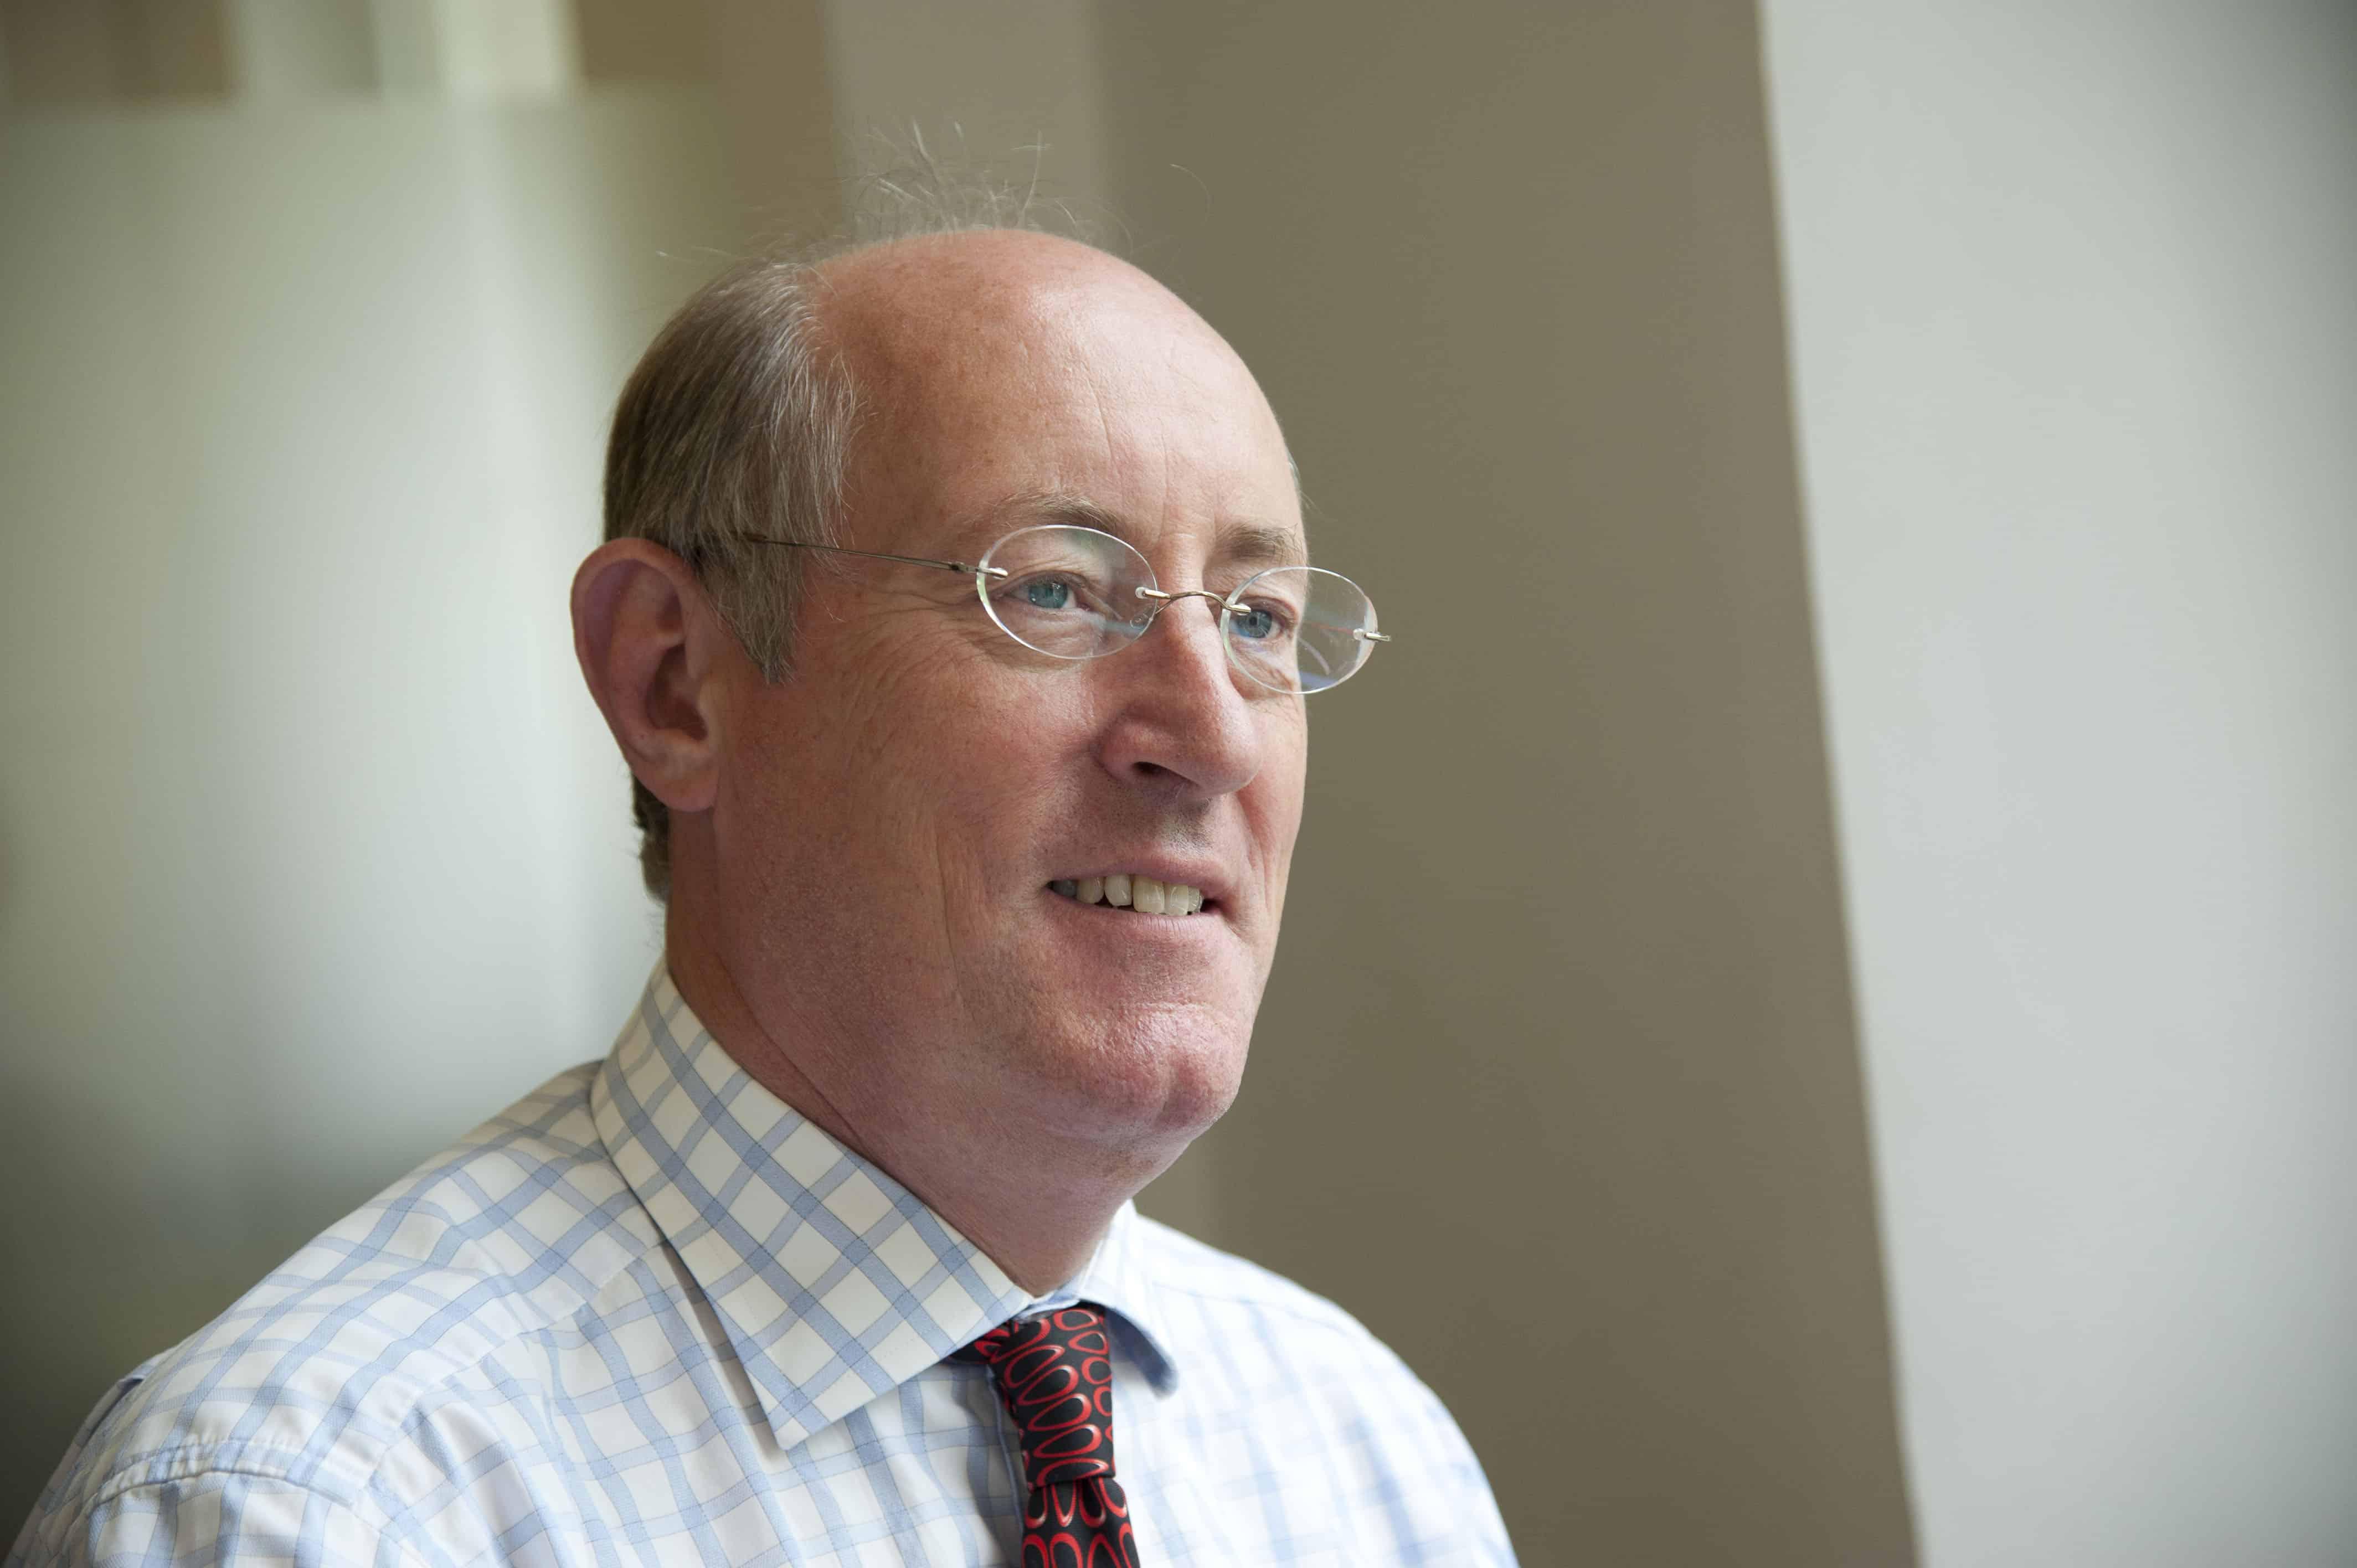 RAEng chief executive Philip Greenish